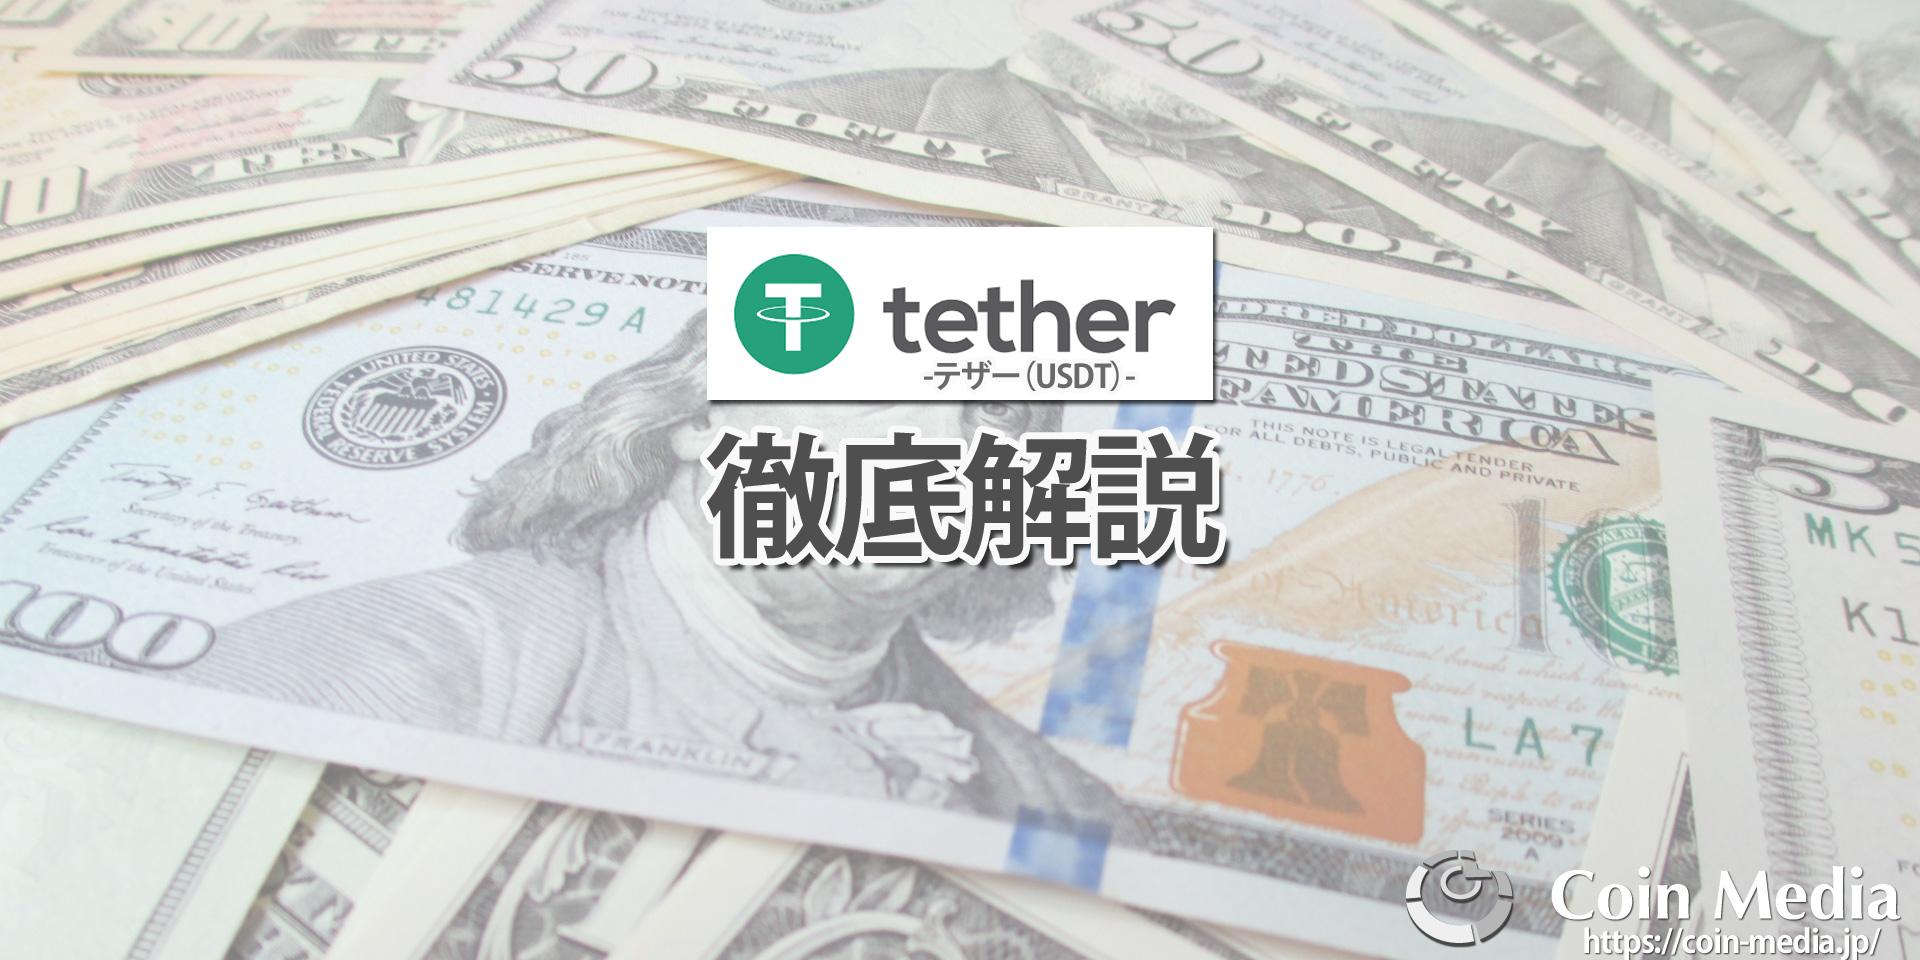 USDT(Tether/テザー)とは?他のステーブルコインとの違いも含めて解説